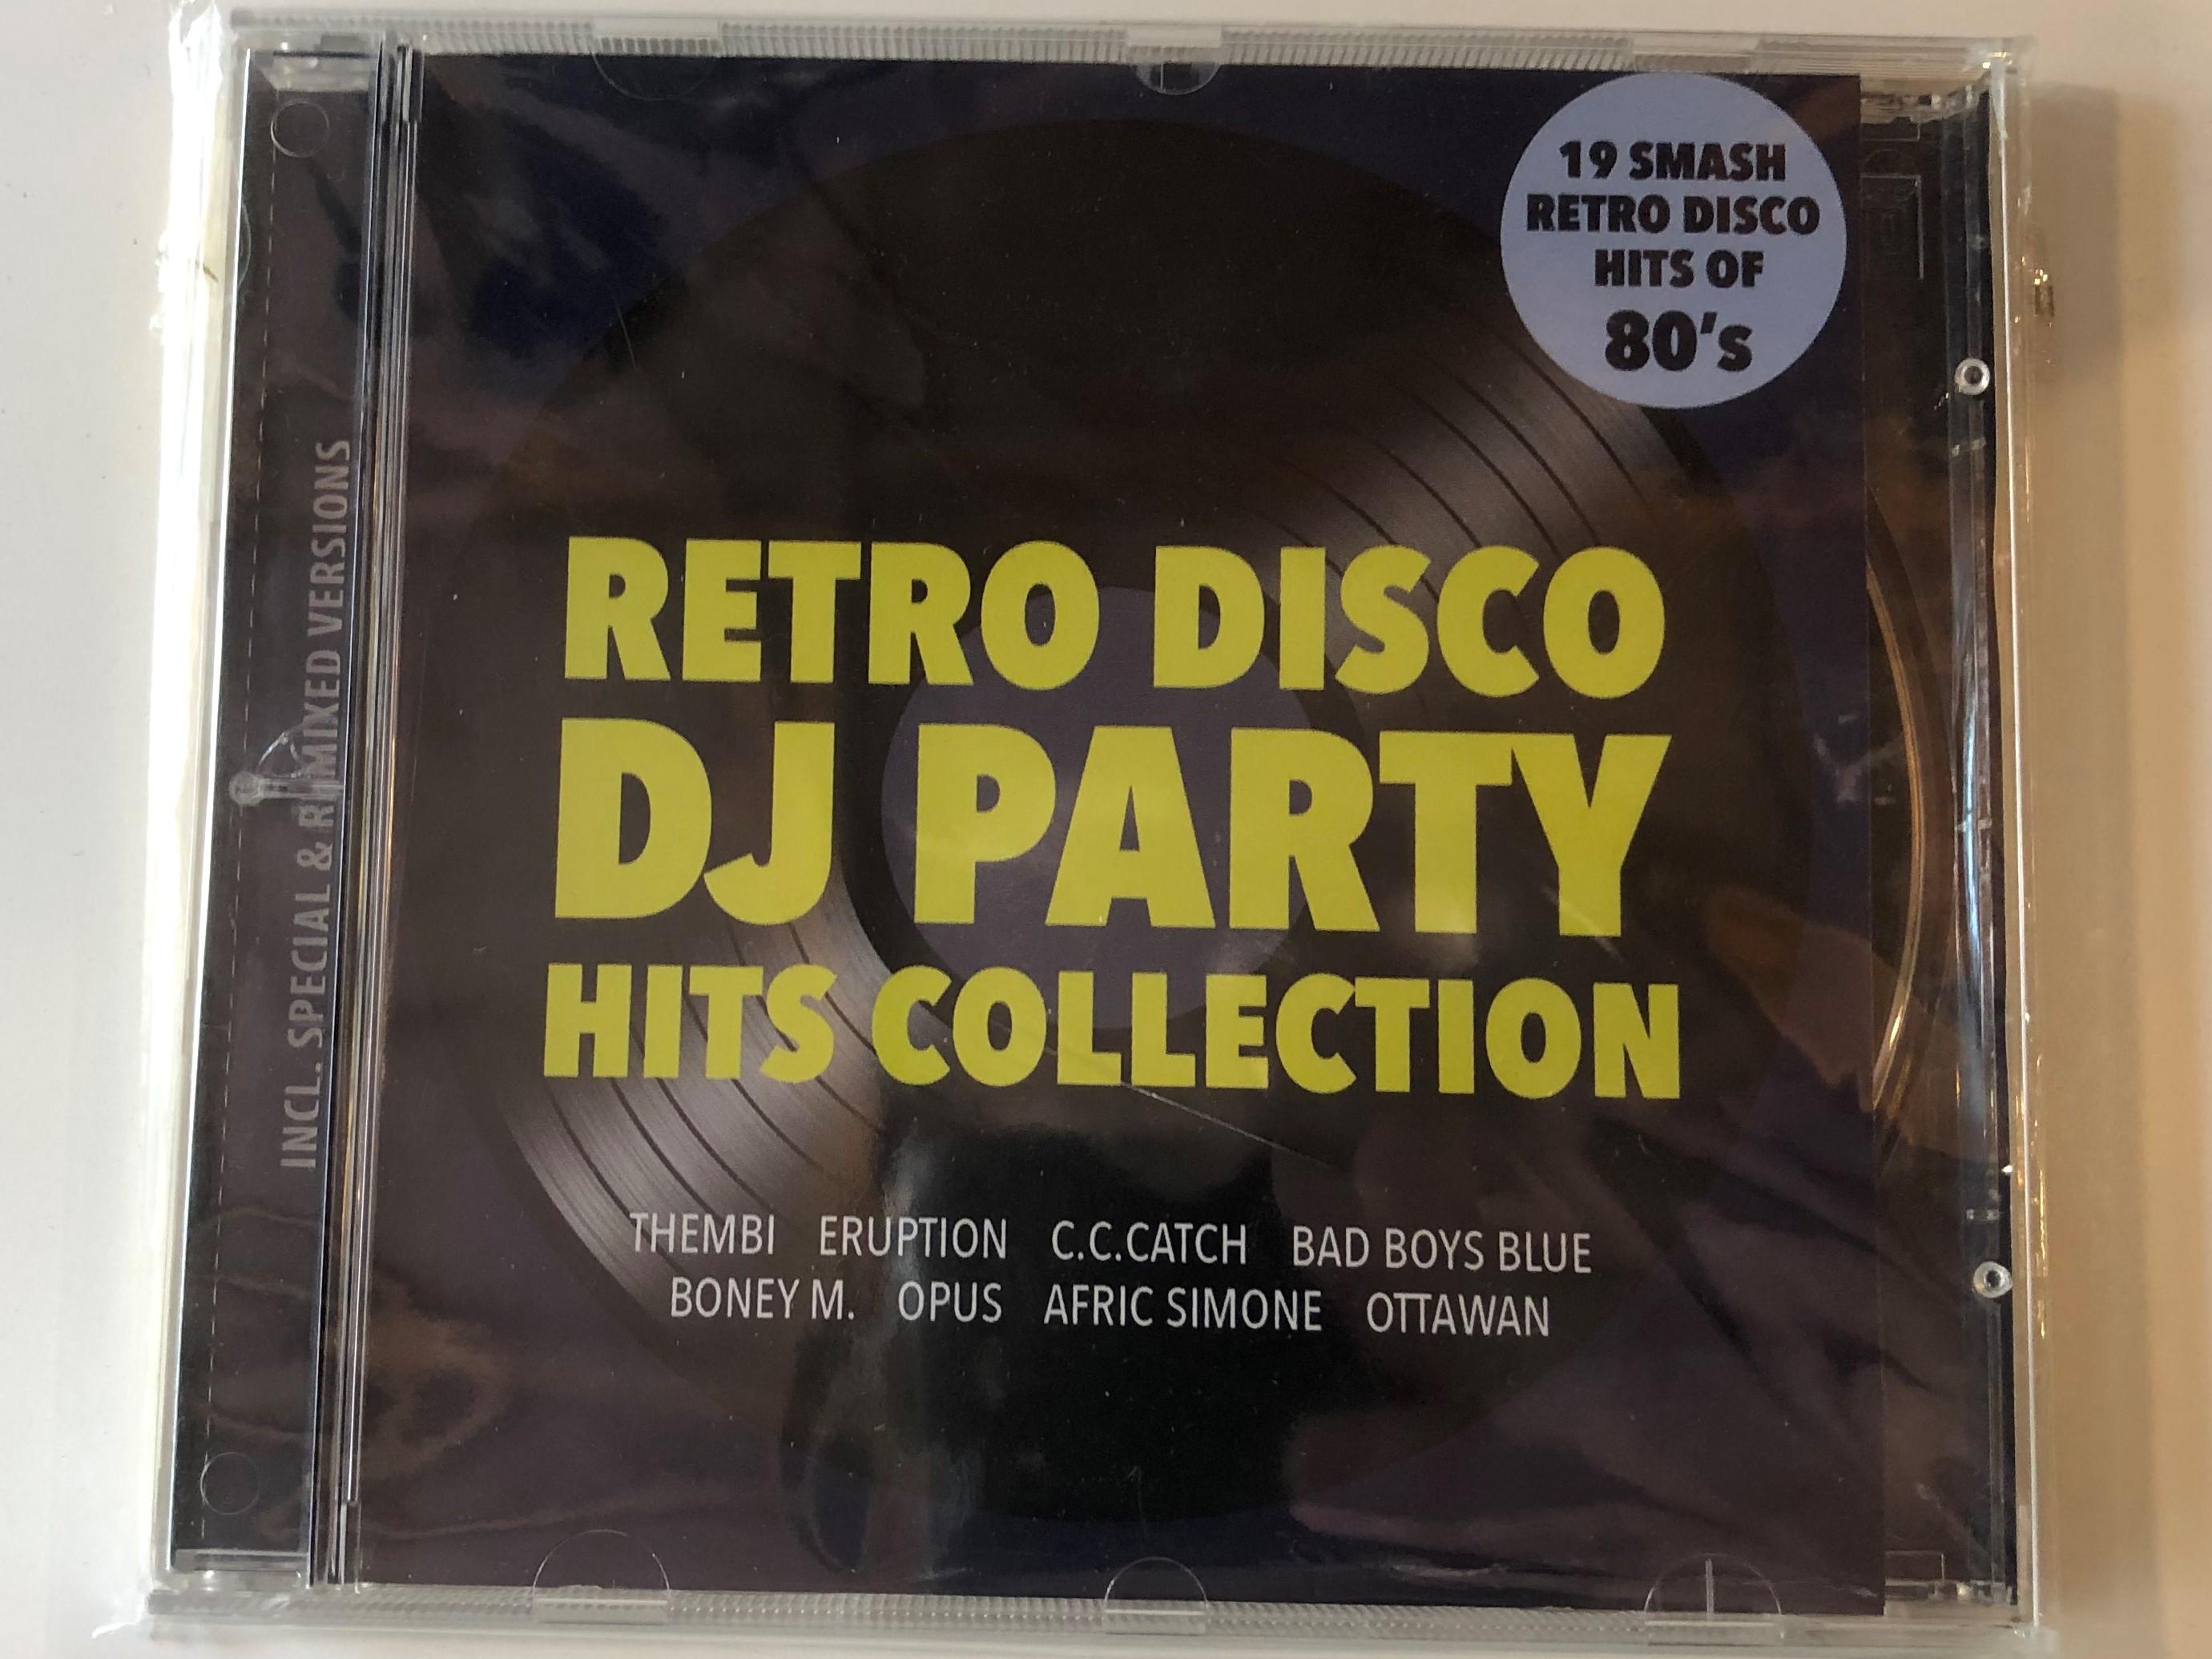 retro-disco-dj-party-hits-collection-thembi-eruption-c.c.catch-bad-boys-blue-boney-m.-opus-afric-simone-ottawan-19-smash-retro-disco-hits-of-80-s-retro-records-audio-cd-rr-cd0601b-1-.jpg